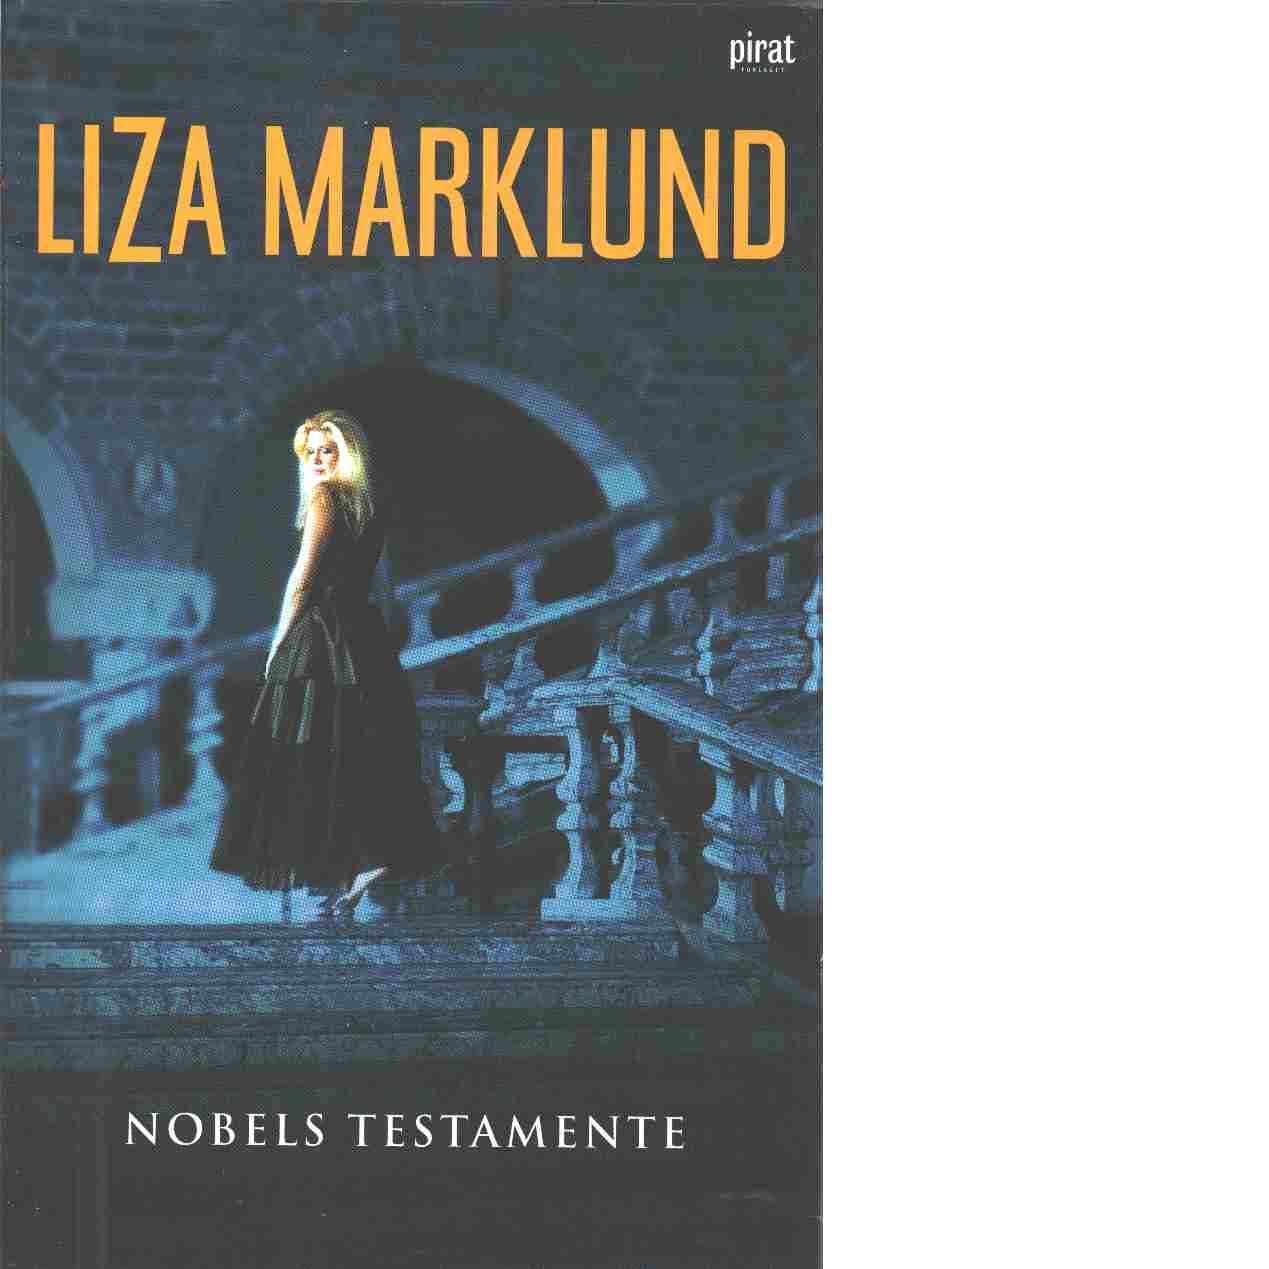 Nobels testamente - Marklund, Liza